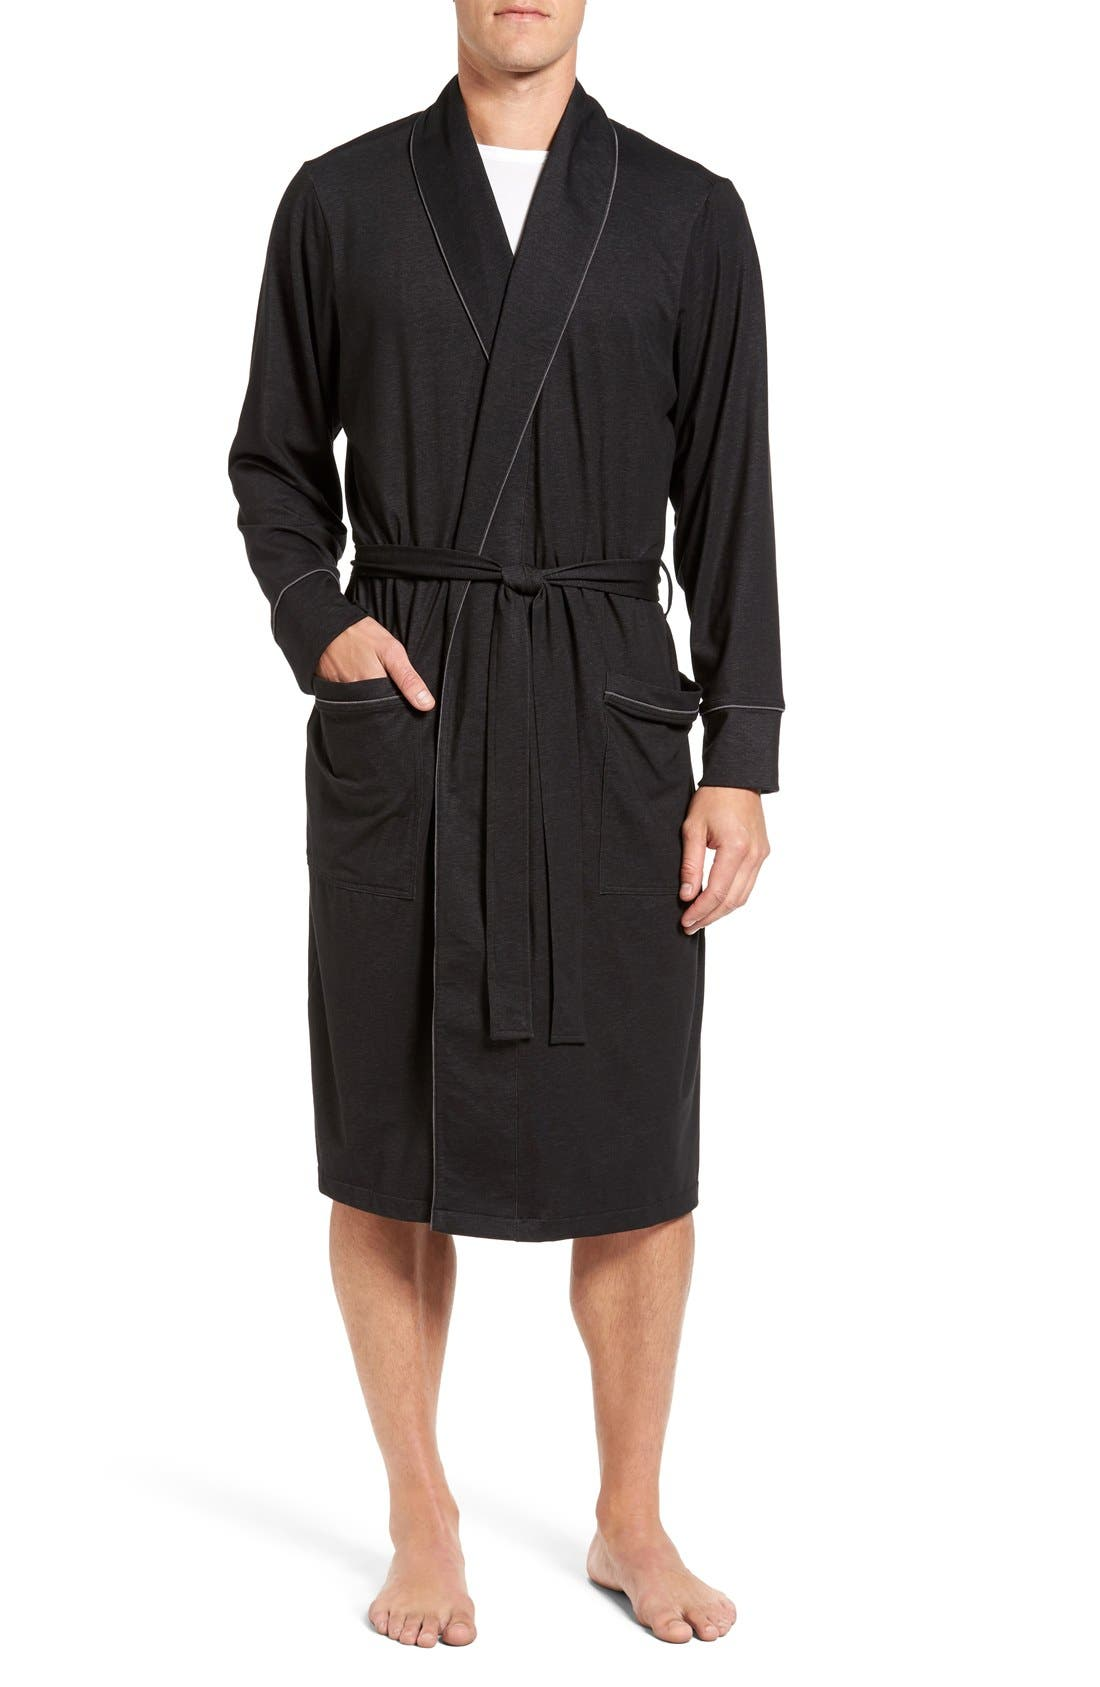 Cotton Blend Robe,                         Main,                         color, Black/ Charcoal